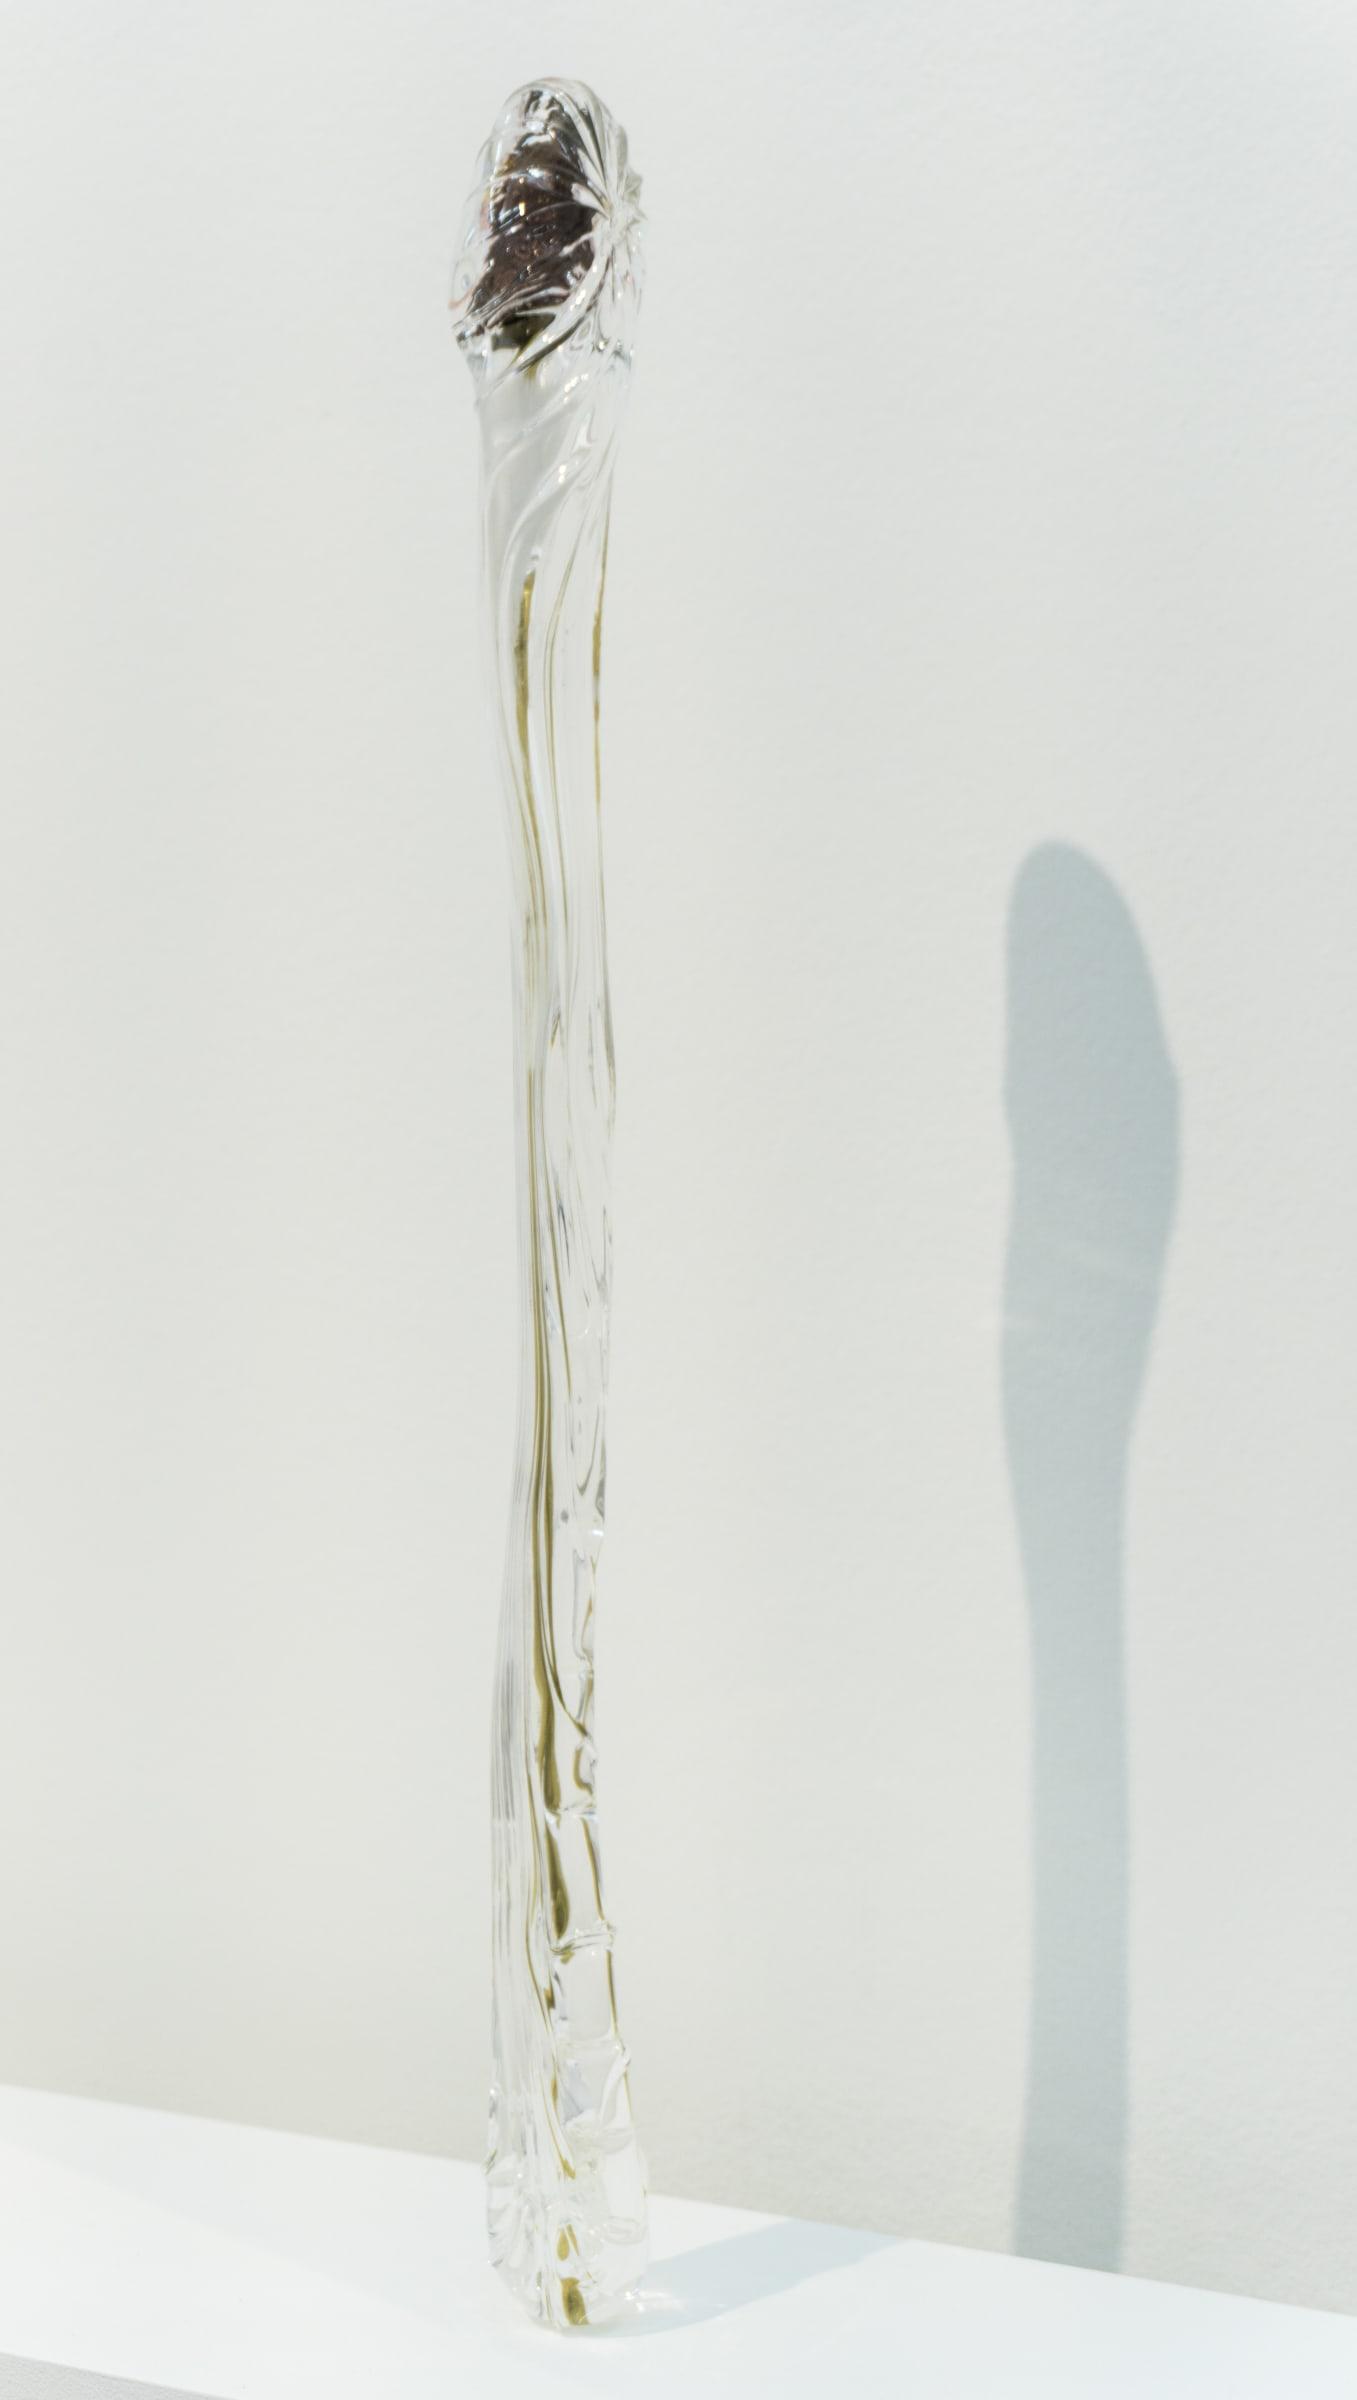 "<span class=""link fancybox-details-link""><a href=""/exhibitions/166/works/artworks15318/"">View Detail Page</a></span><div class=""artist""><strong>Kelly Akashi</strong></div><div class=""title""><em>Figured Finger (Encased Digit)</em>, 2018</div><div class=""medium"">glass, bronze</div><div class=""dimensions"">58,5 x 5 x 5 cm<br></div>"